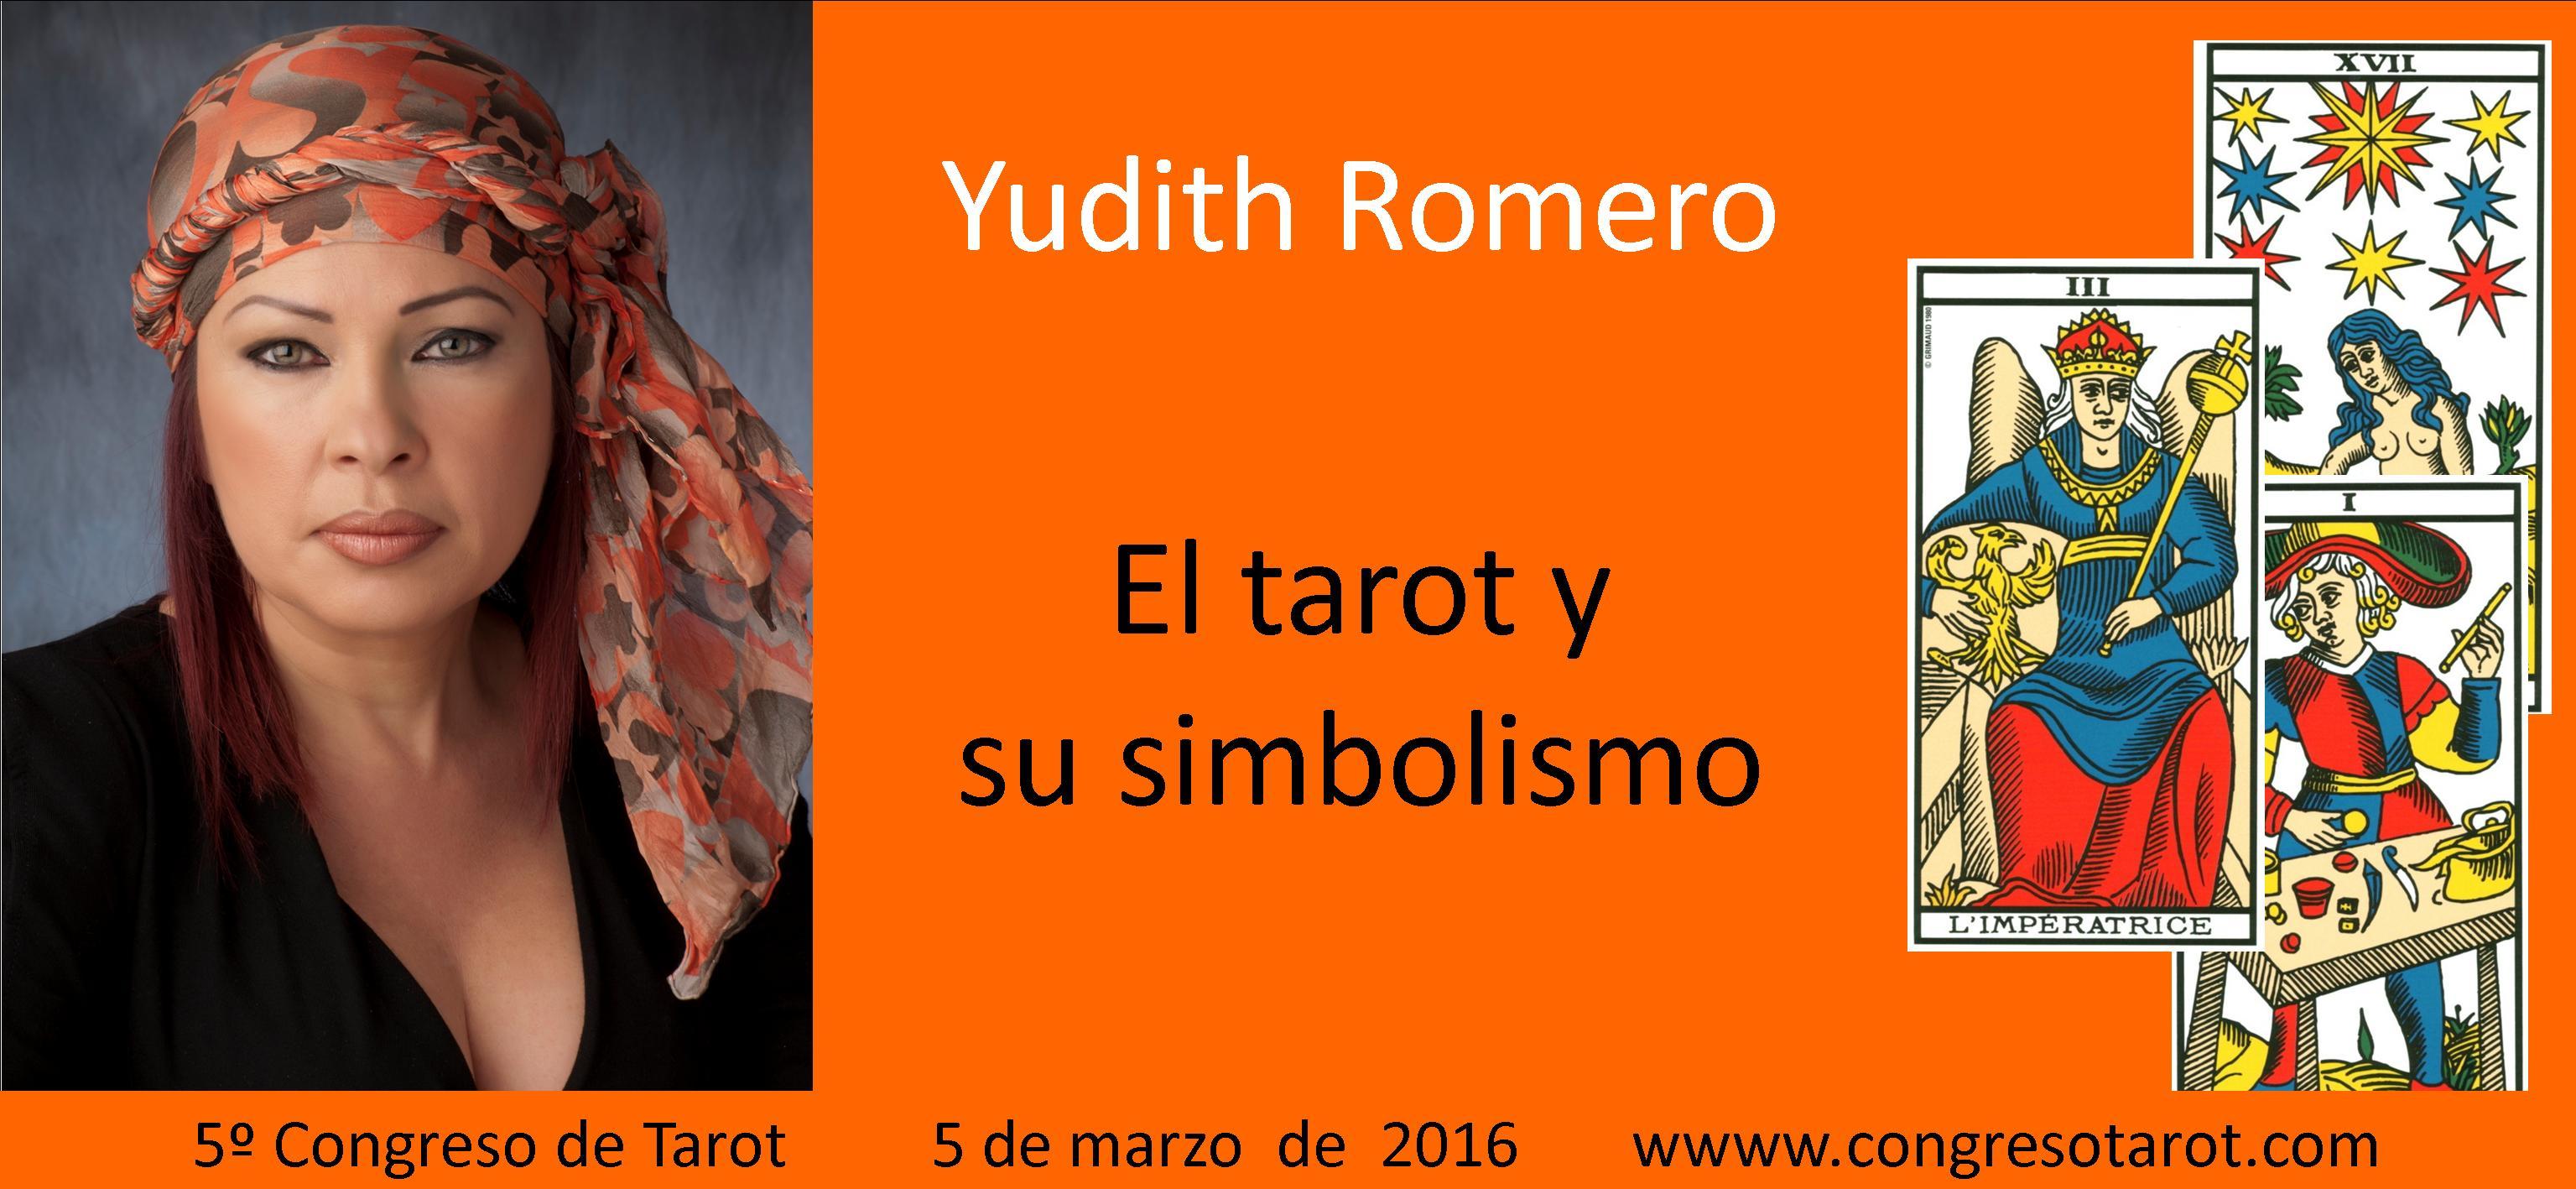 Yudith Romero Banner ponencia